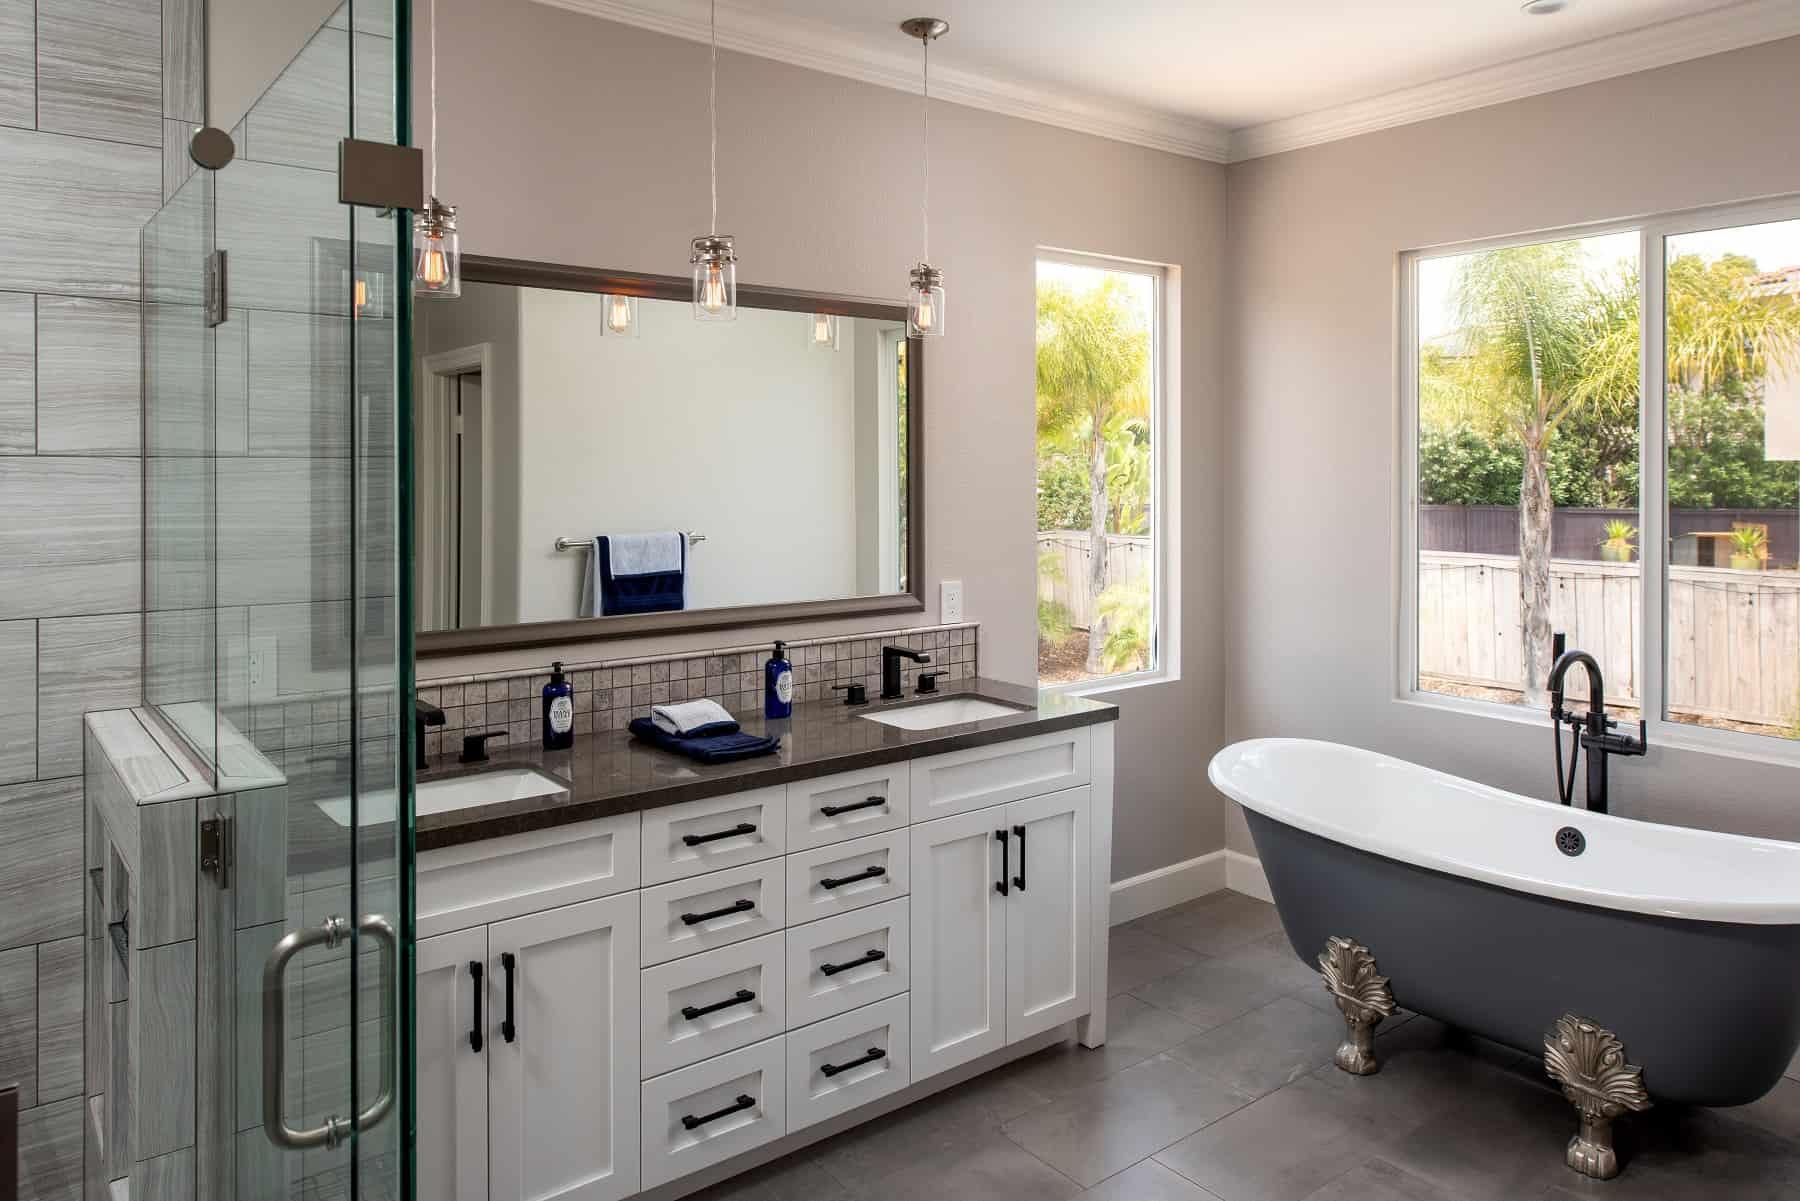 Zen Bathroom Design Ideas | Remodel Works on Bathroom Remodel Design Ideas  id=78212